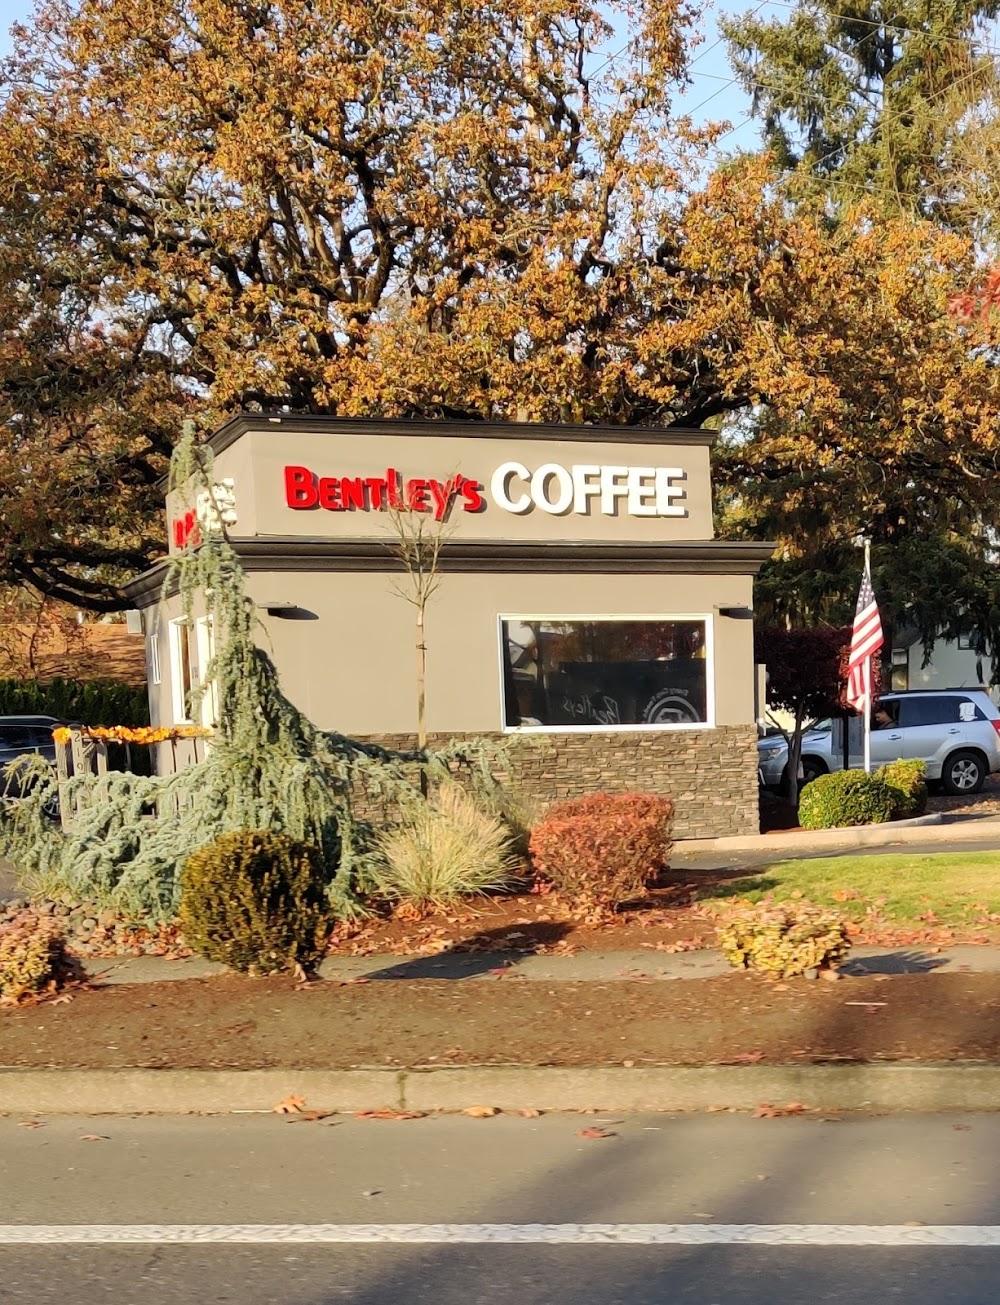 Bentley's Coffee